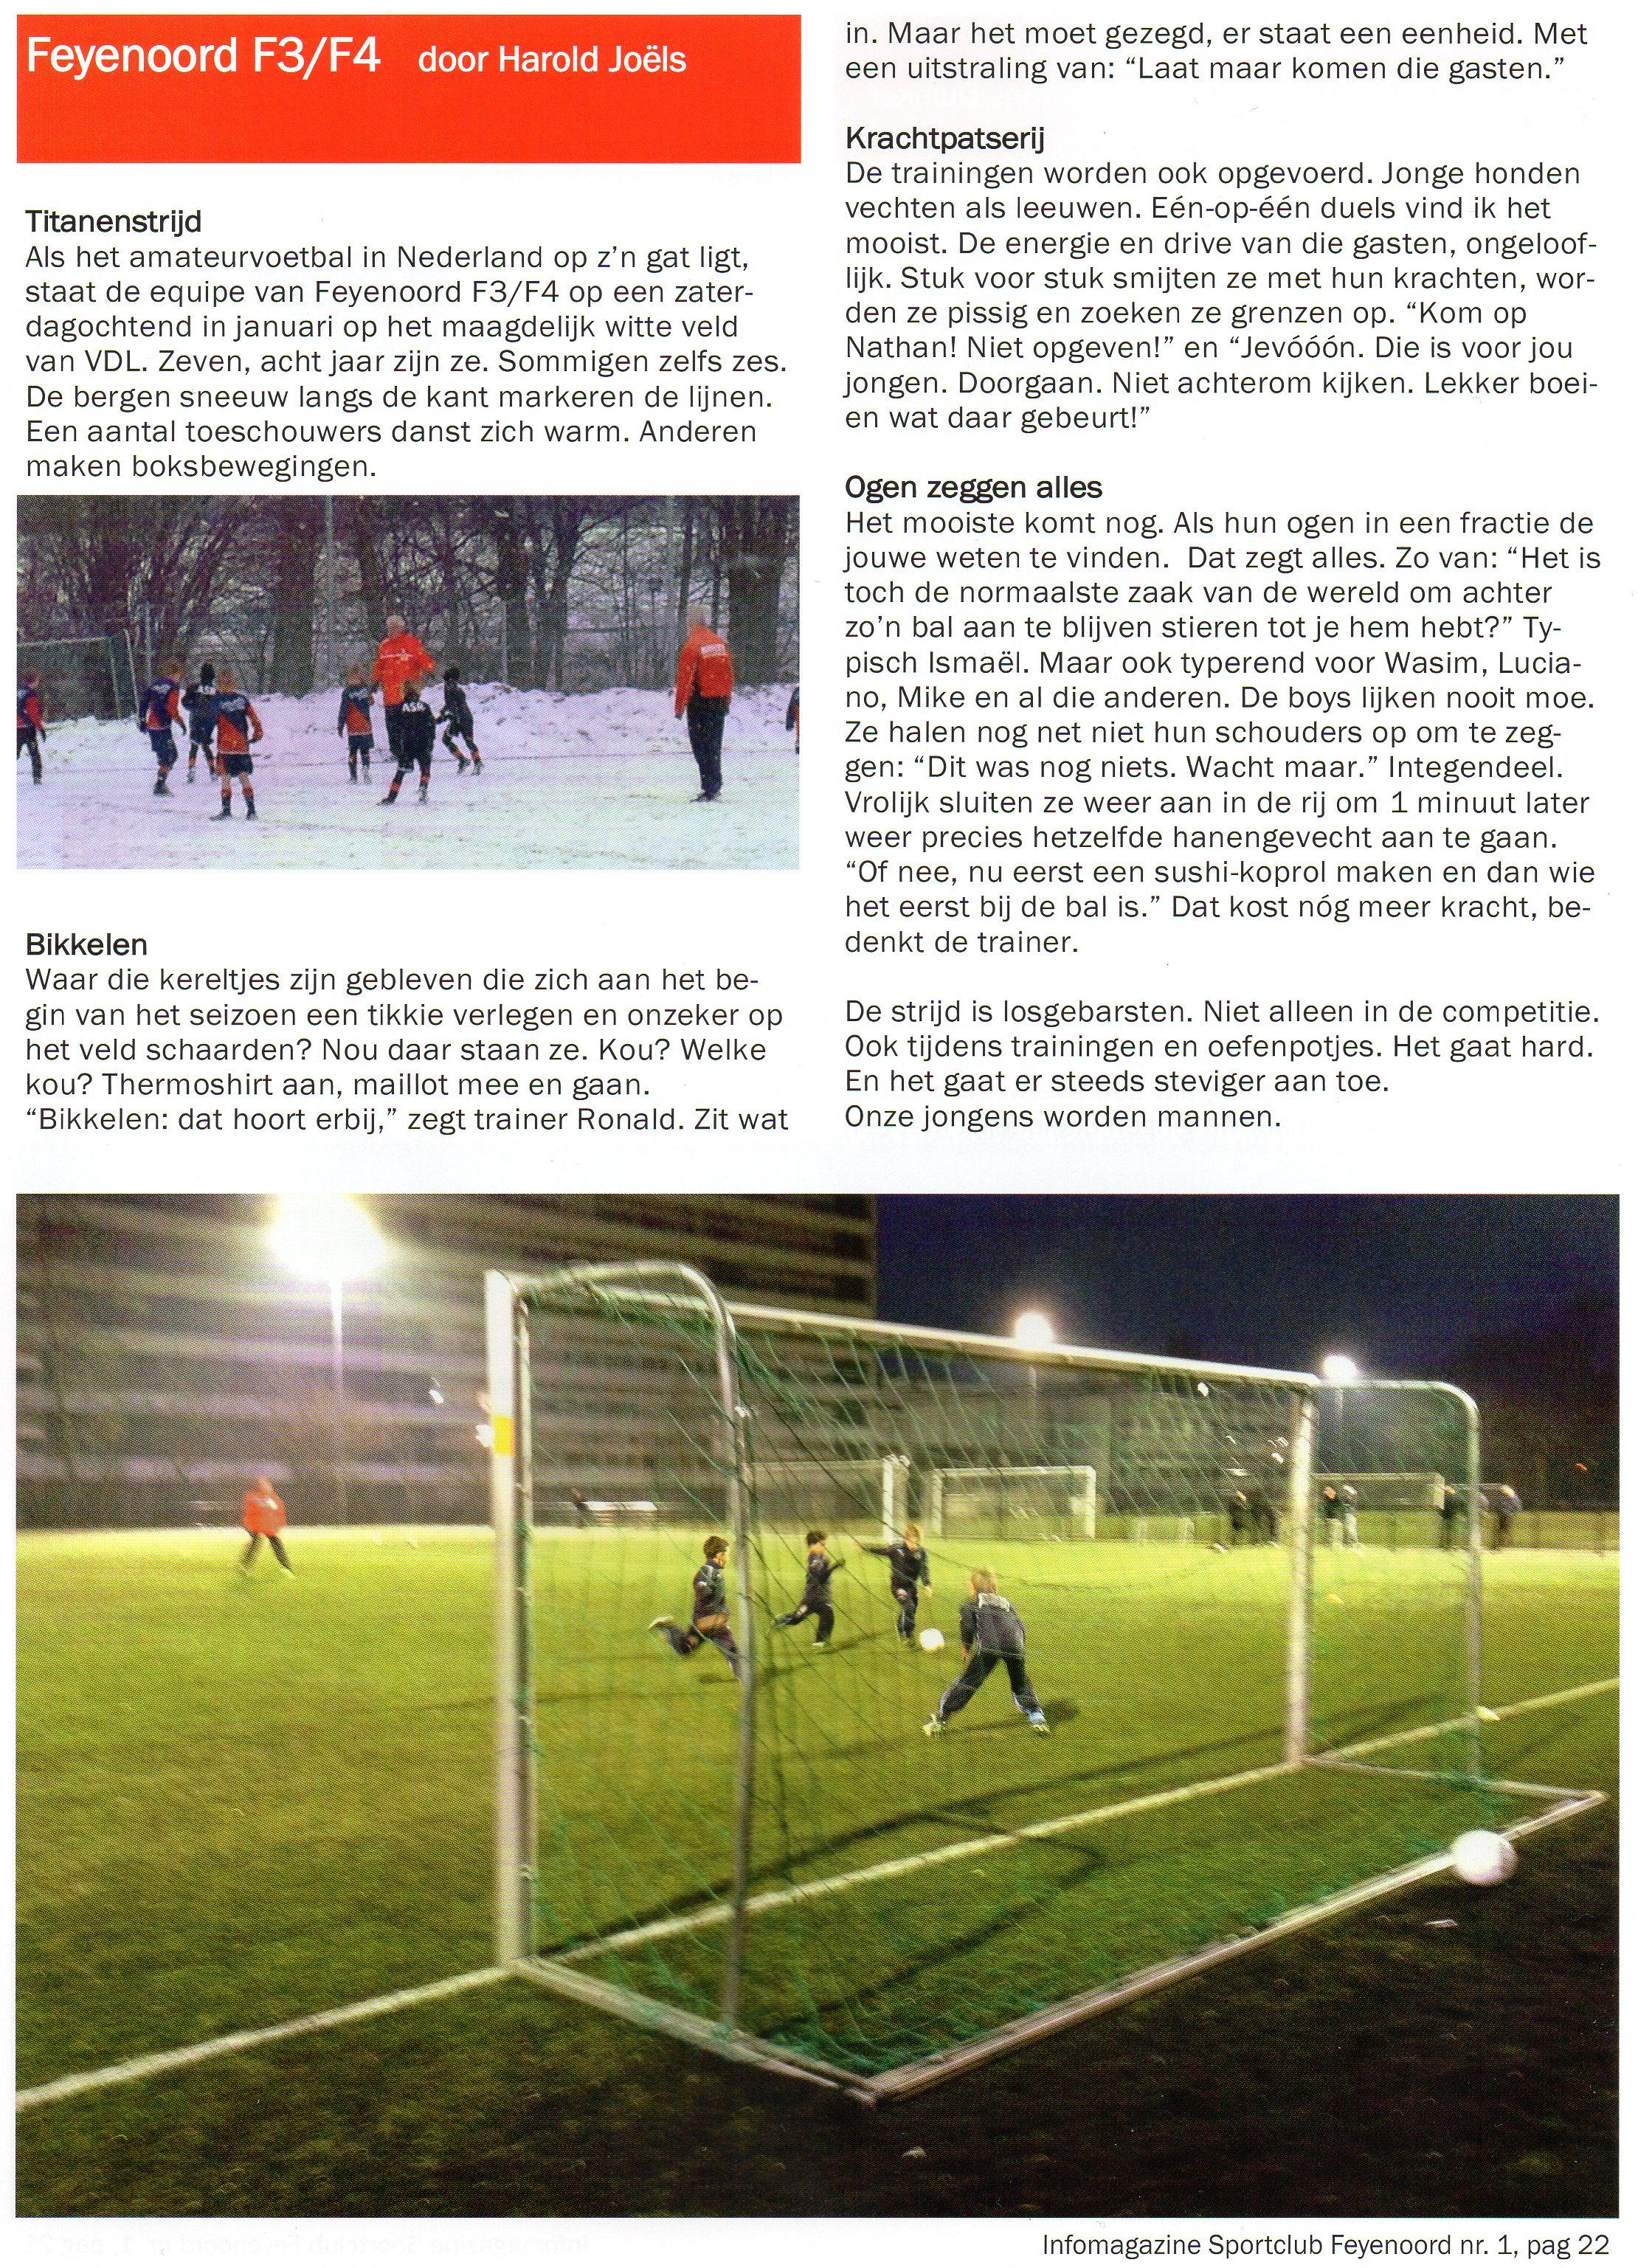 Artikel in informatiemagazine SC Feyenoord